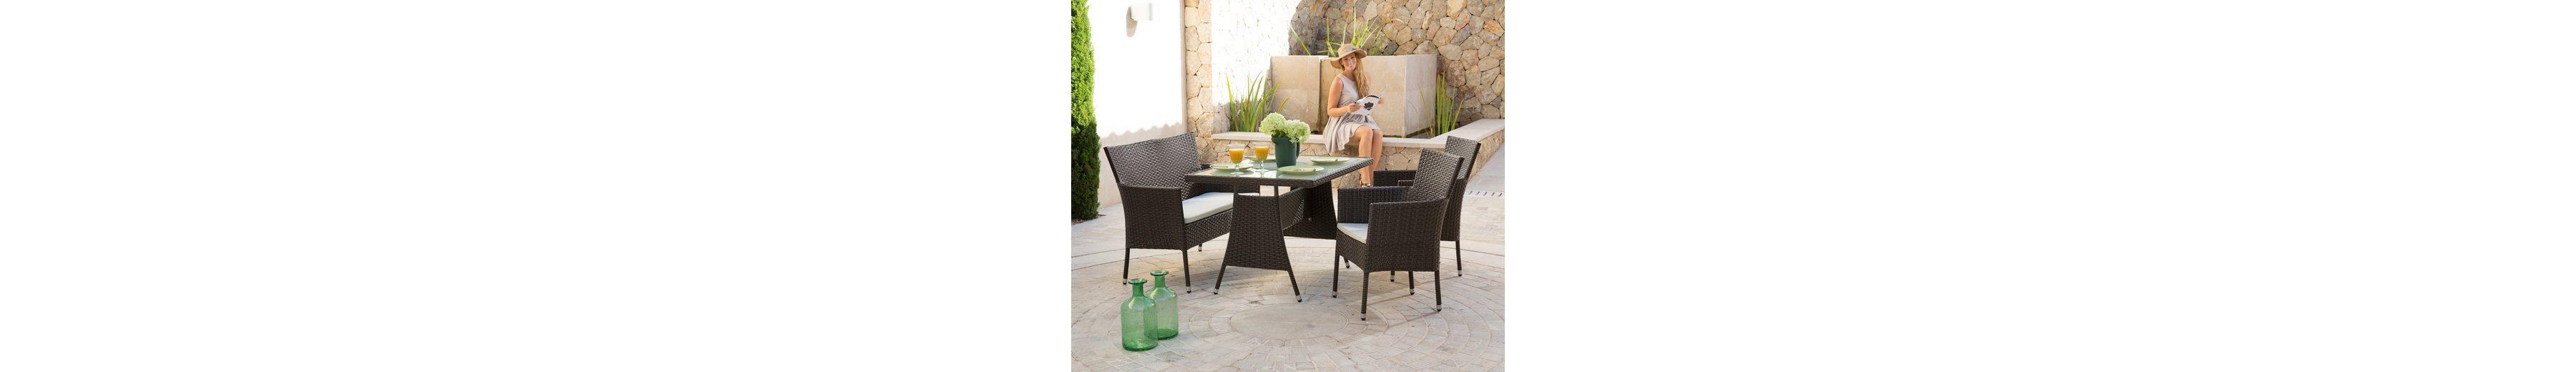 7-tgl. Gartenmöbelset »Trentino«, 2 Sessel, Bank, Tisch 120x80 cm, Kunststoff, braun